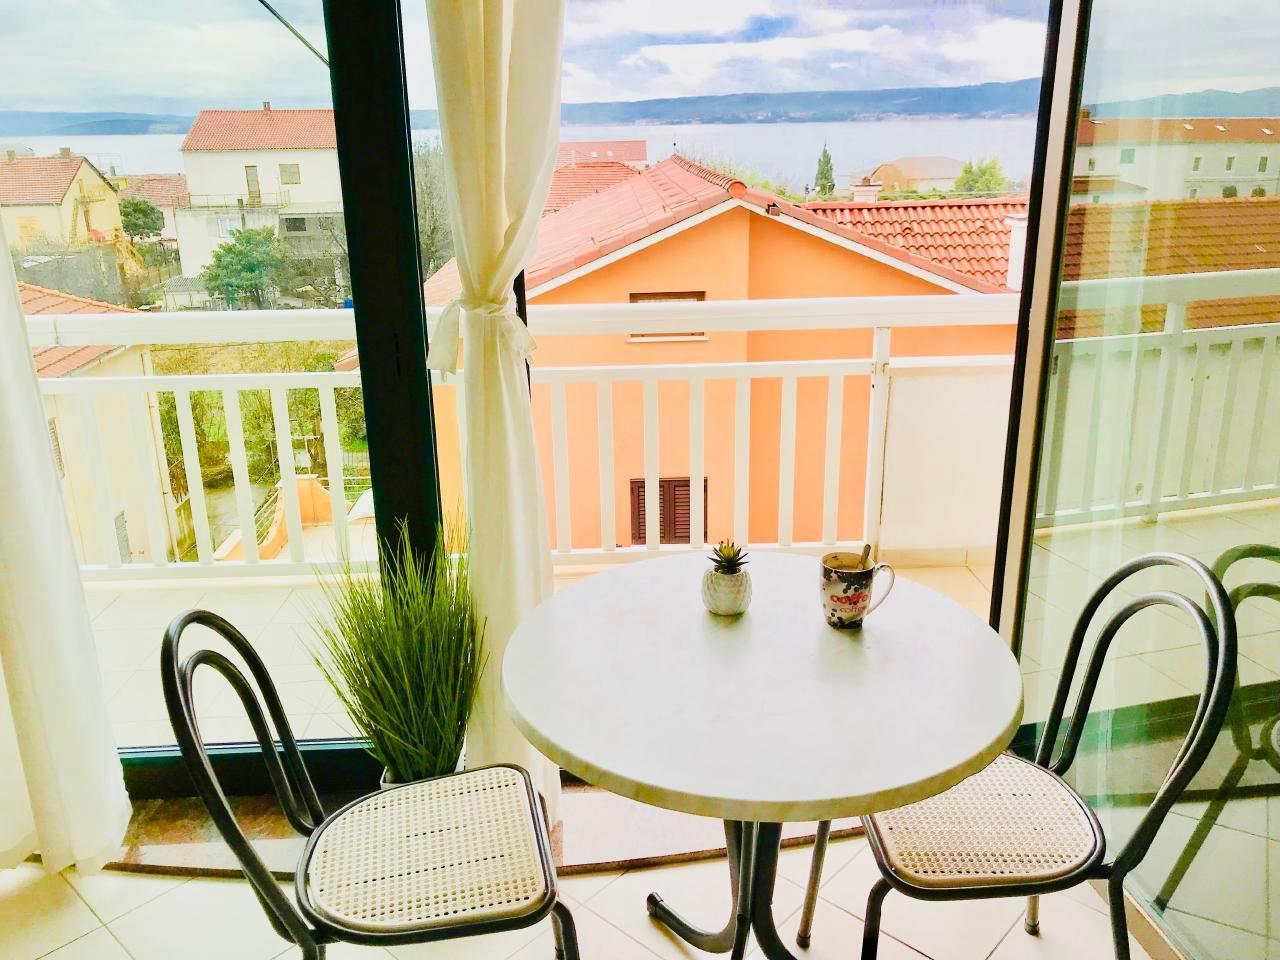 Ferienwohnung Apartmenthaus Ruza 7 - Studio (98388), Kaštel Štafilić, , Dalmatien, Kroatien, Bild 46